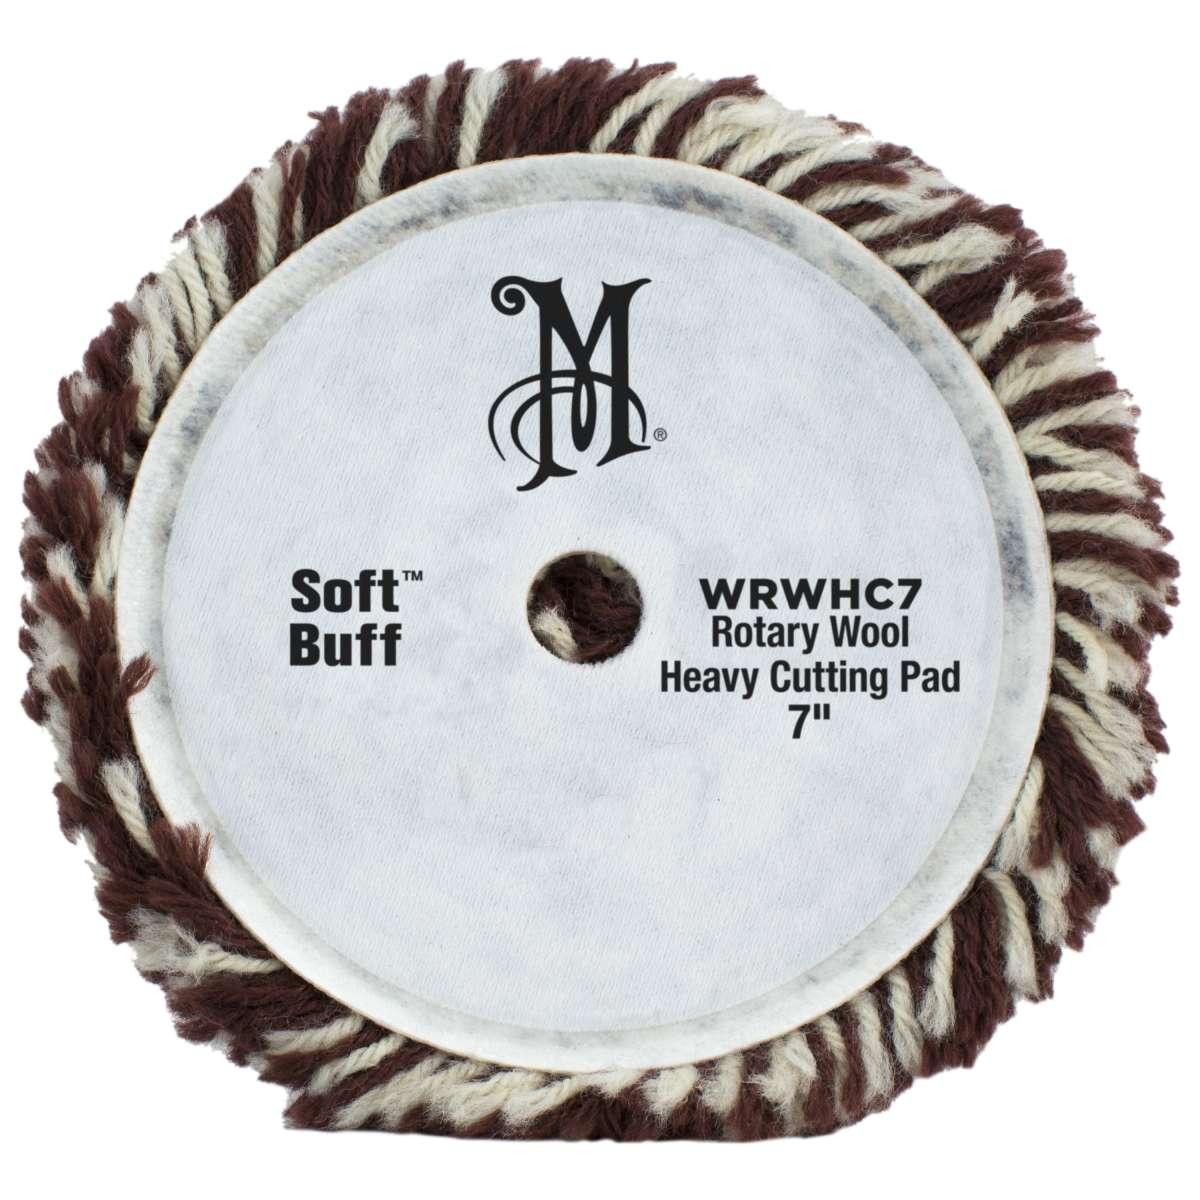 Meguiar's Soft Buff Rotary Wool Heavy Cutting Pad